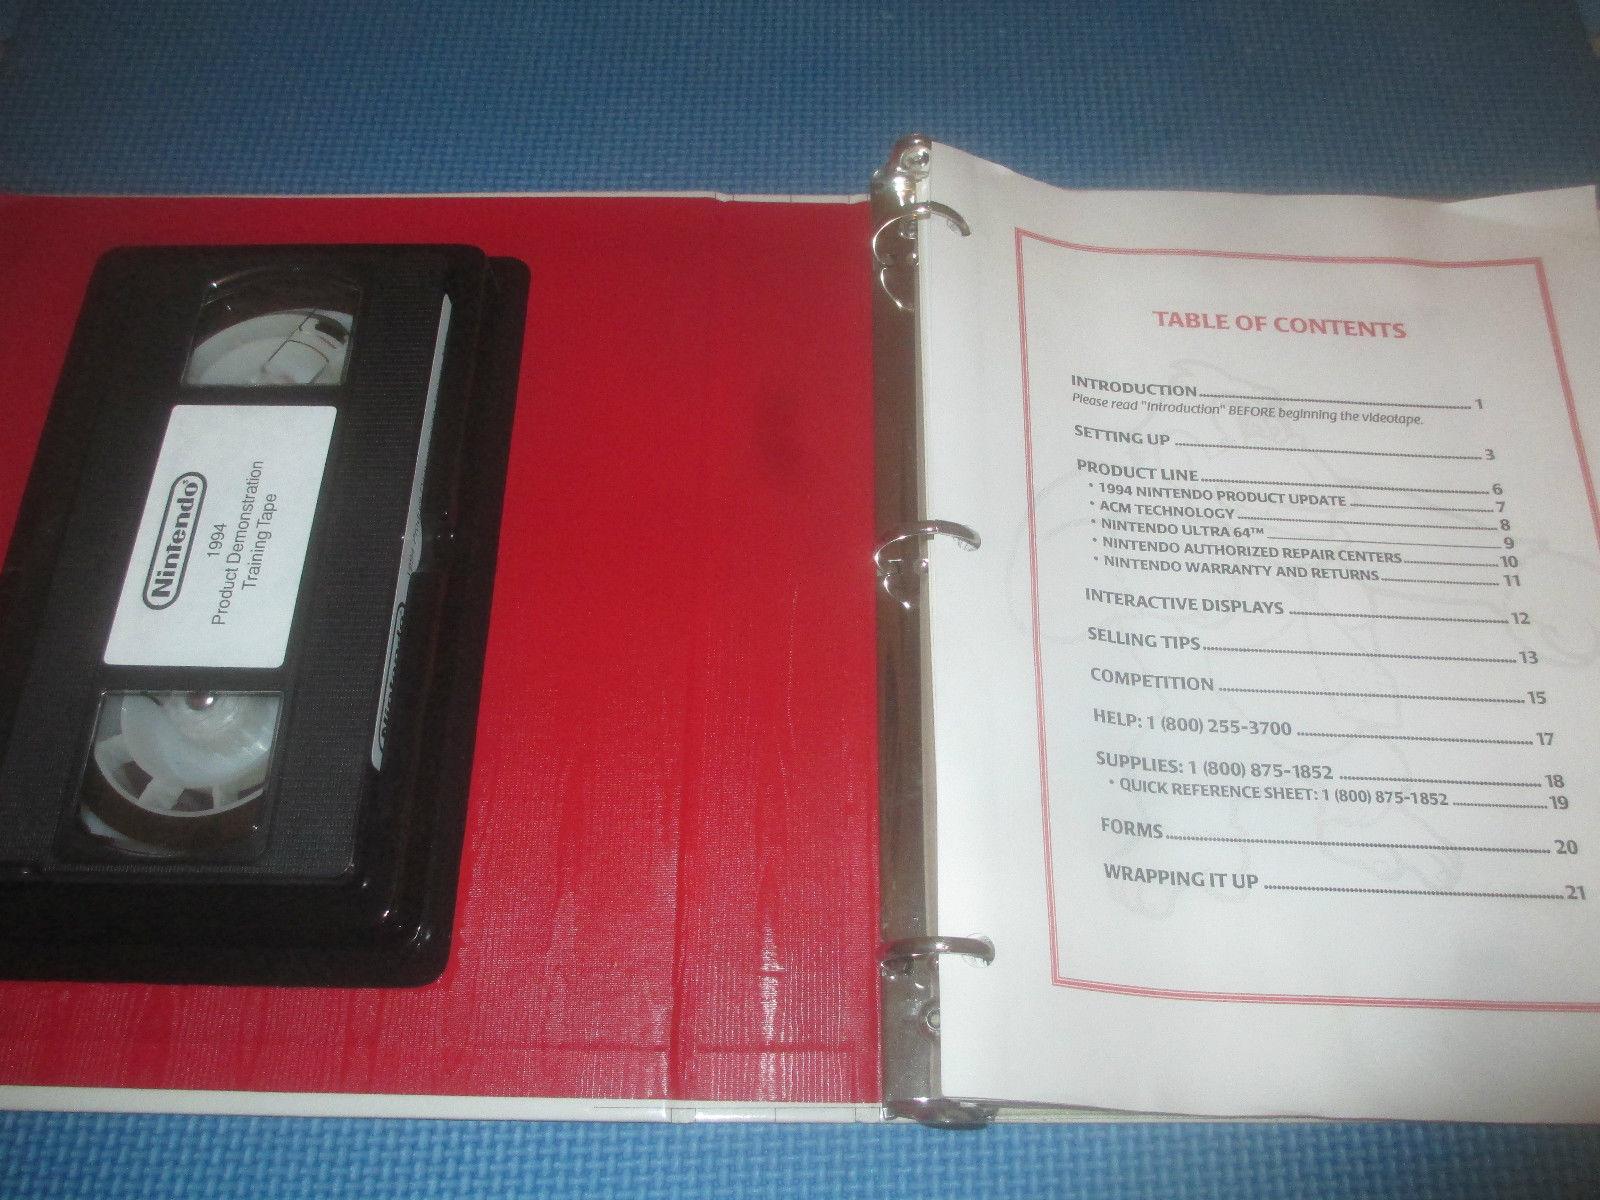 1994holidaybinder2.JPG